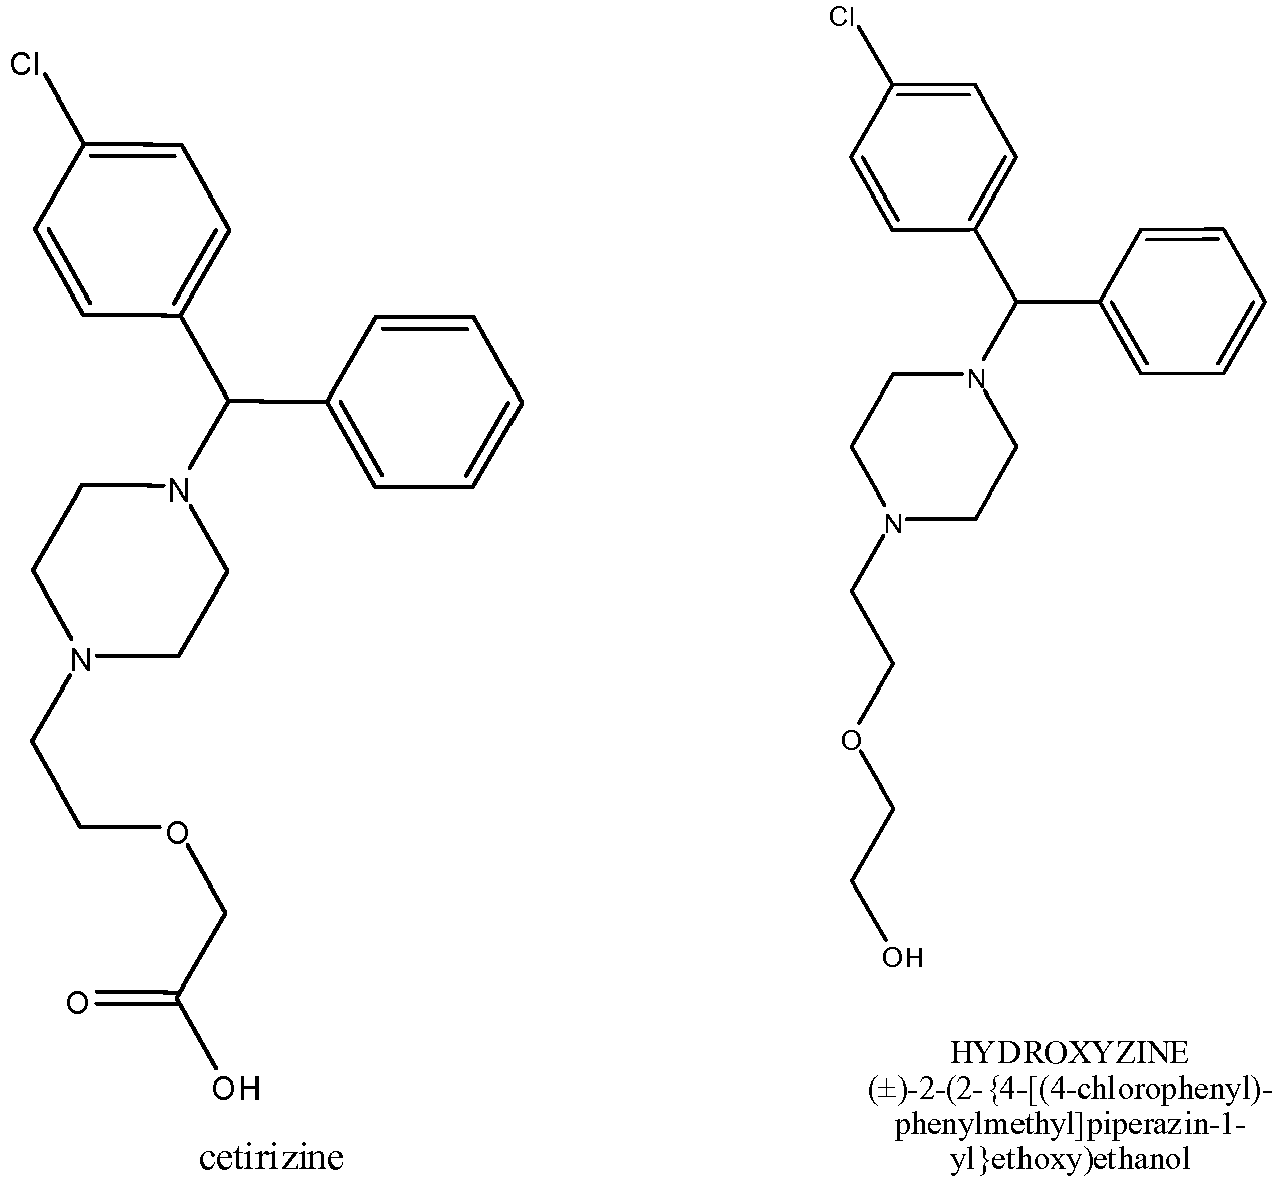 EP2477634B1 - Non-sedating antihistamine injection